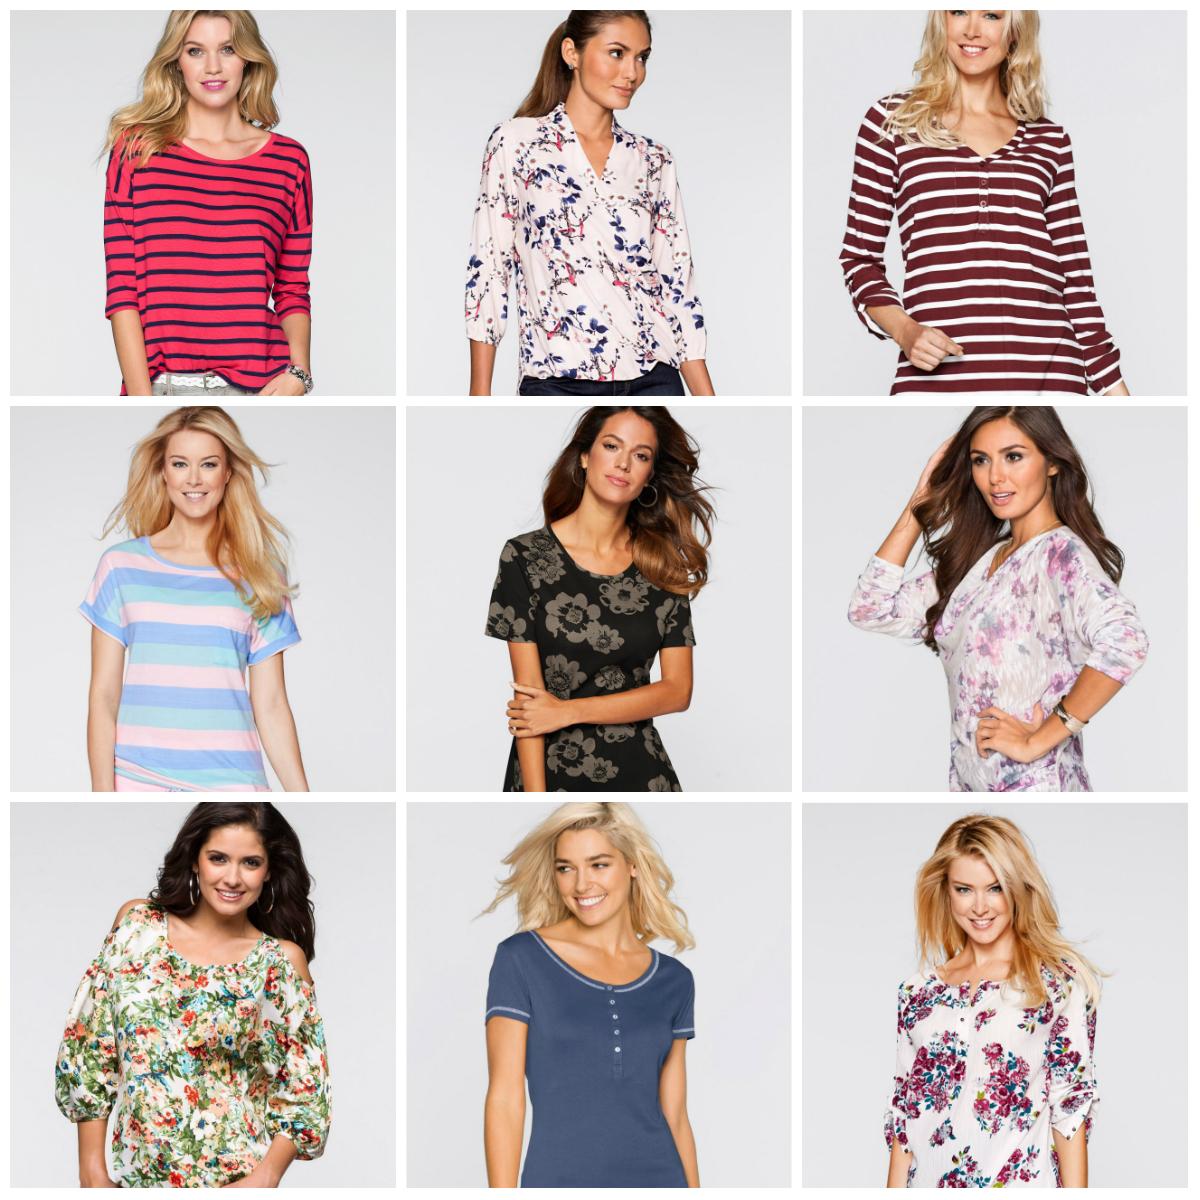 Bluze si tricouri online pentru primavara 2016